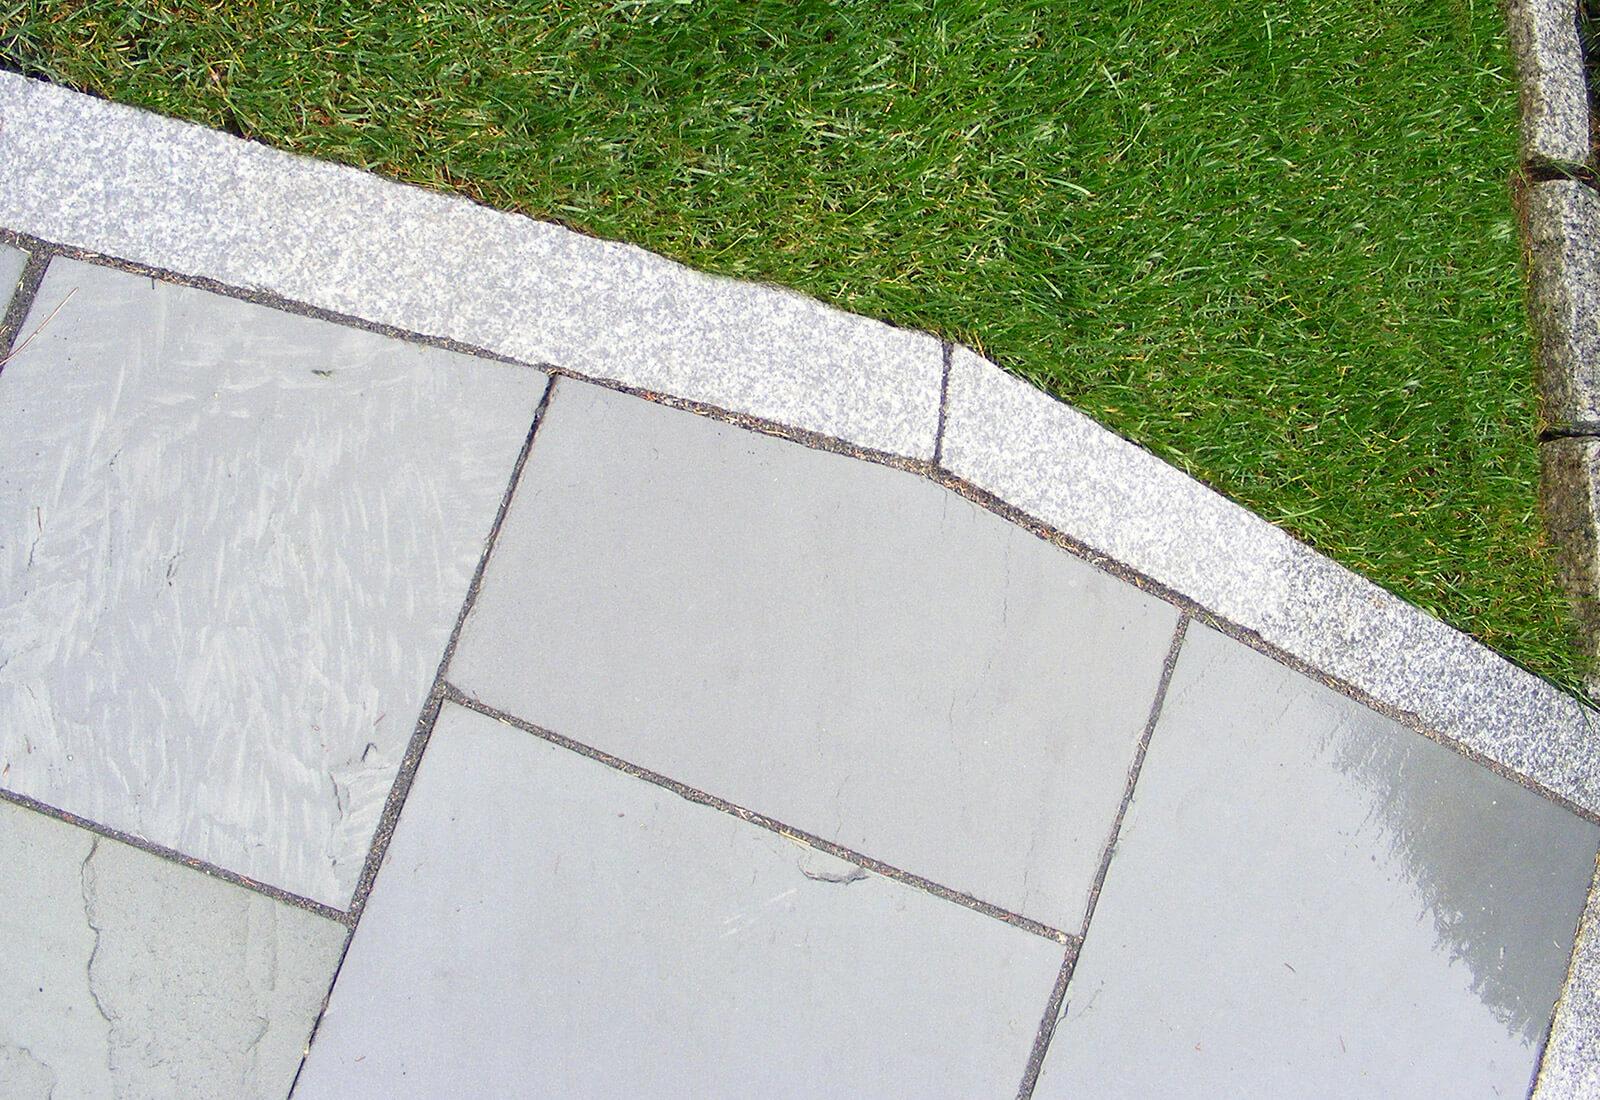 Garden &Driveway edging - Swenson Granite